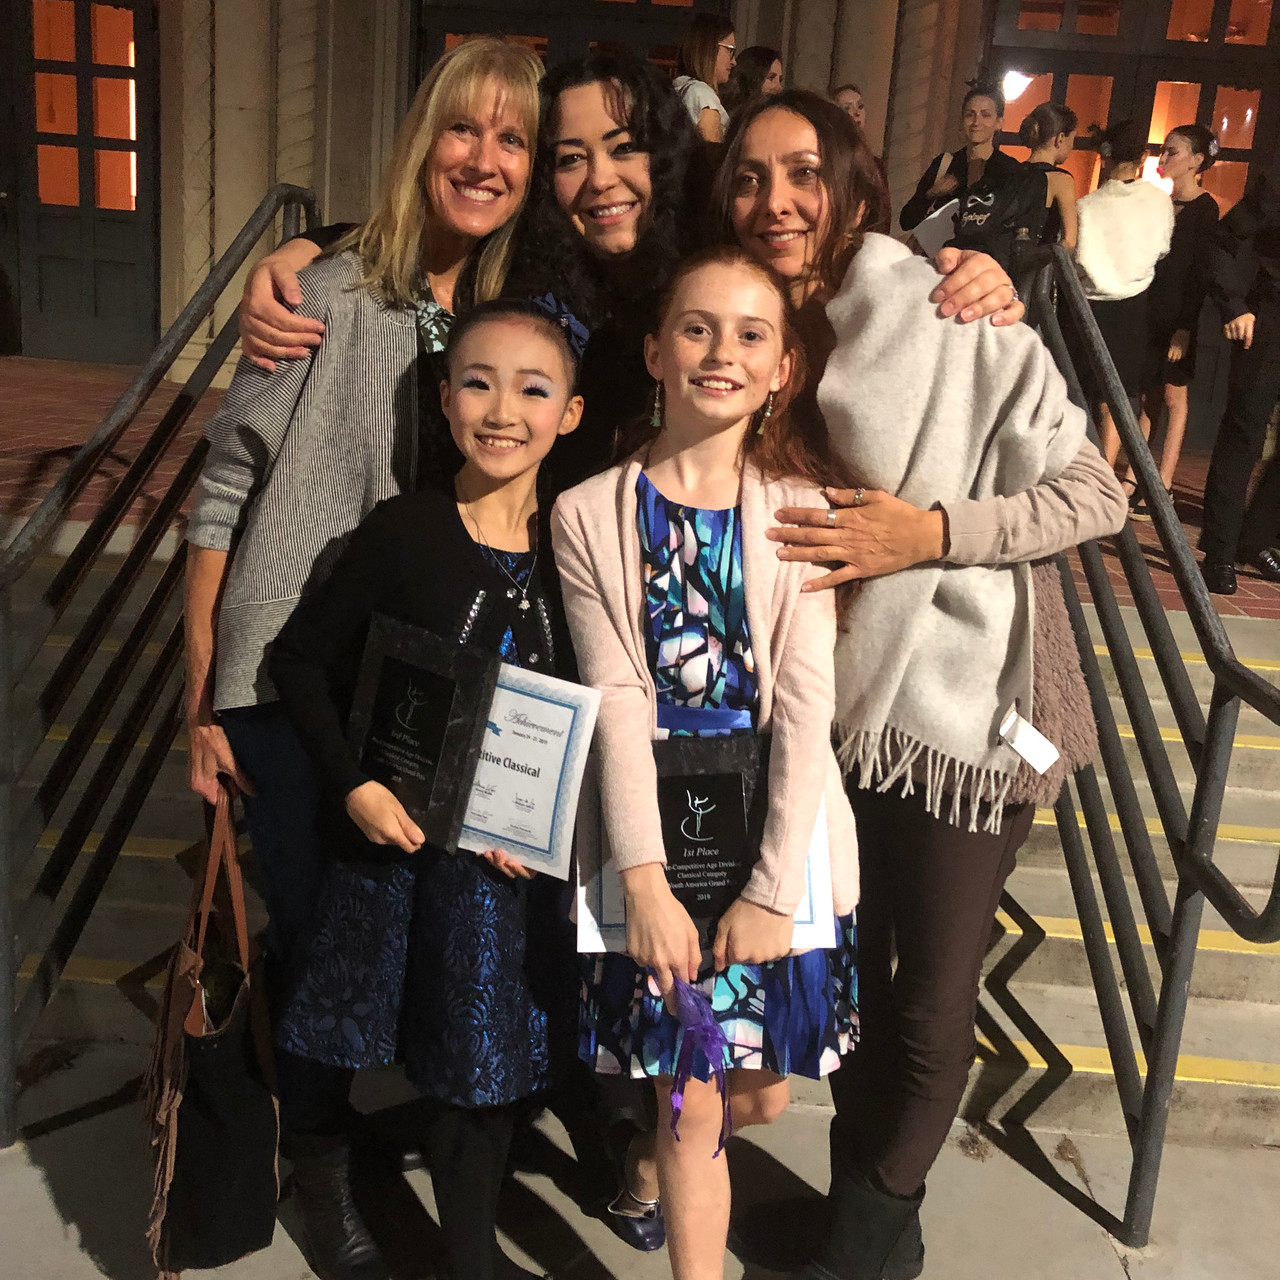 Ms Tita, Ms Vera, Ms Hasmik and top prize winners Mai and Samantha.